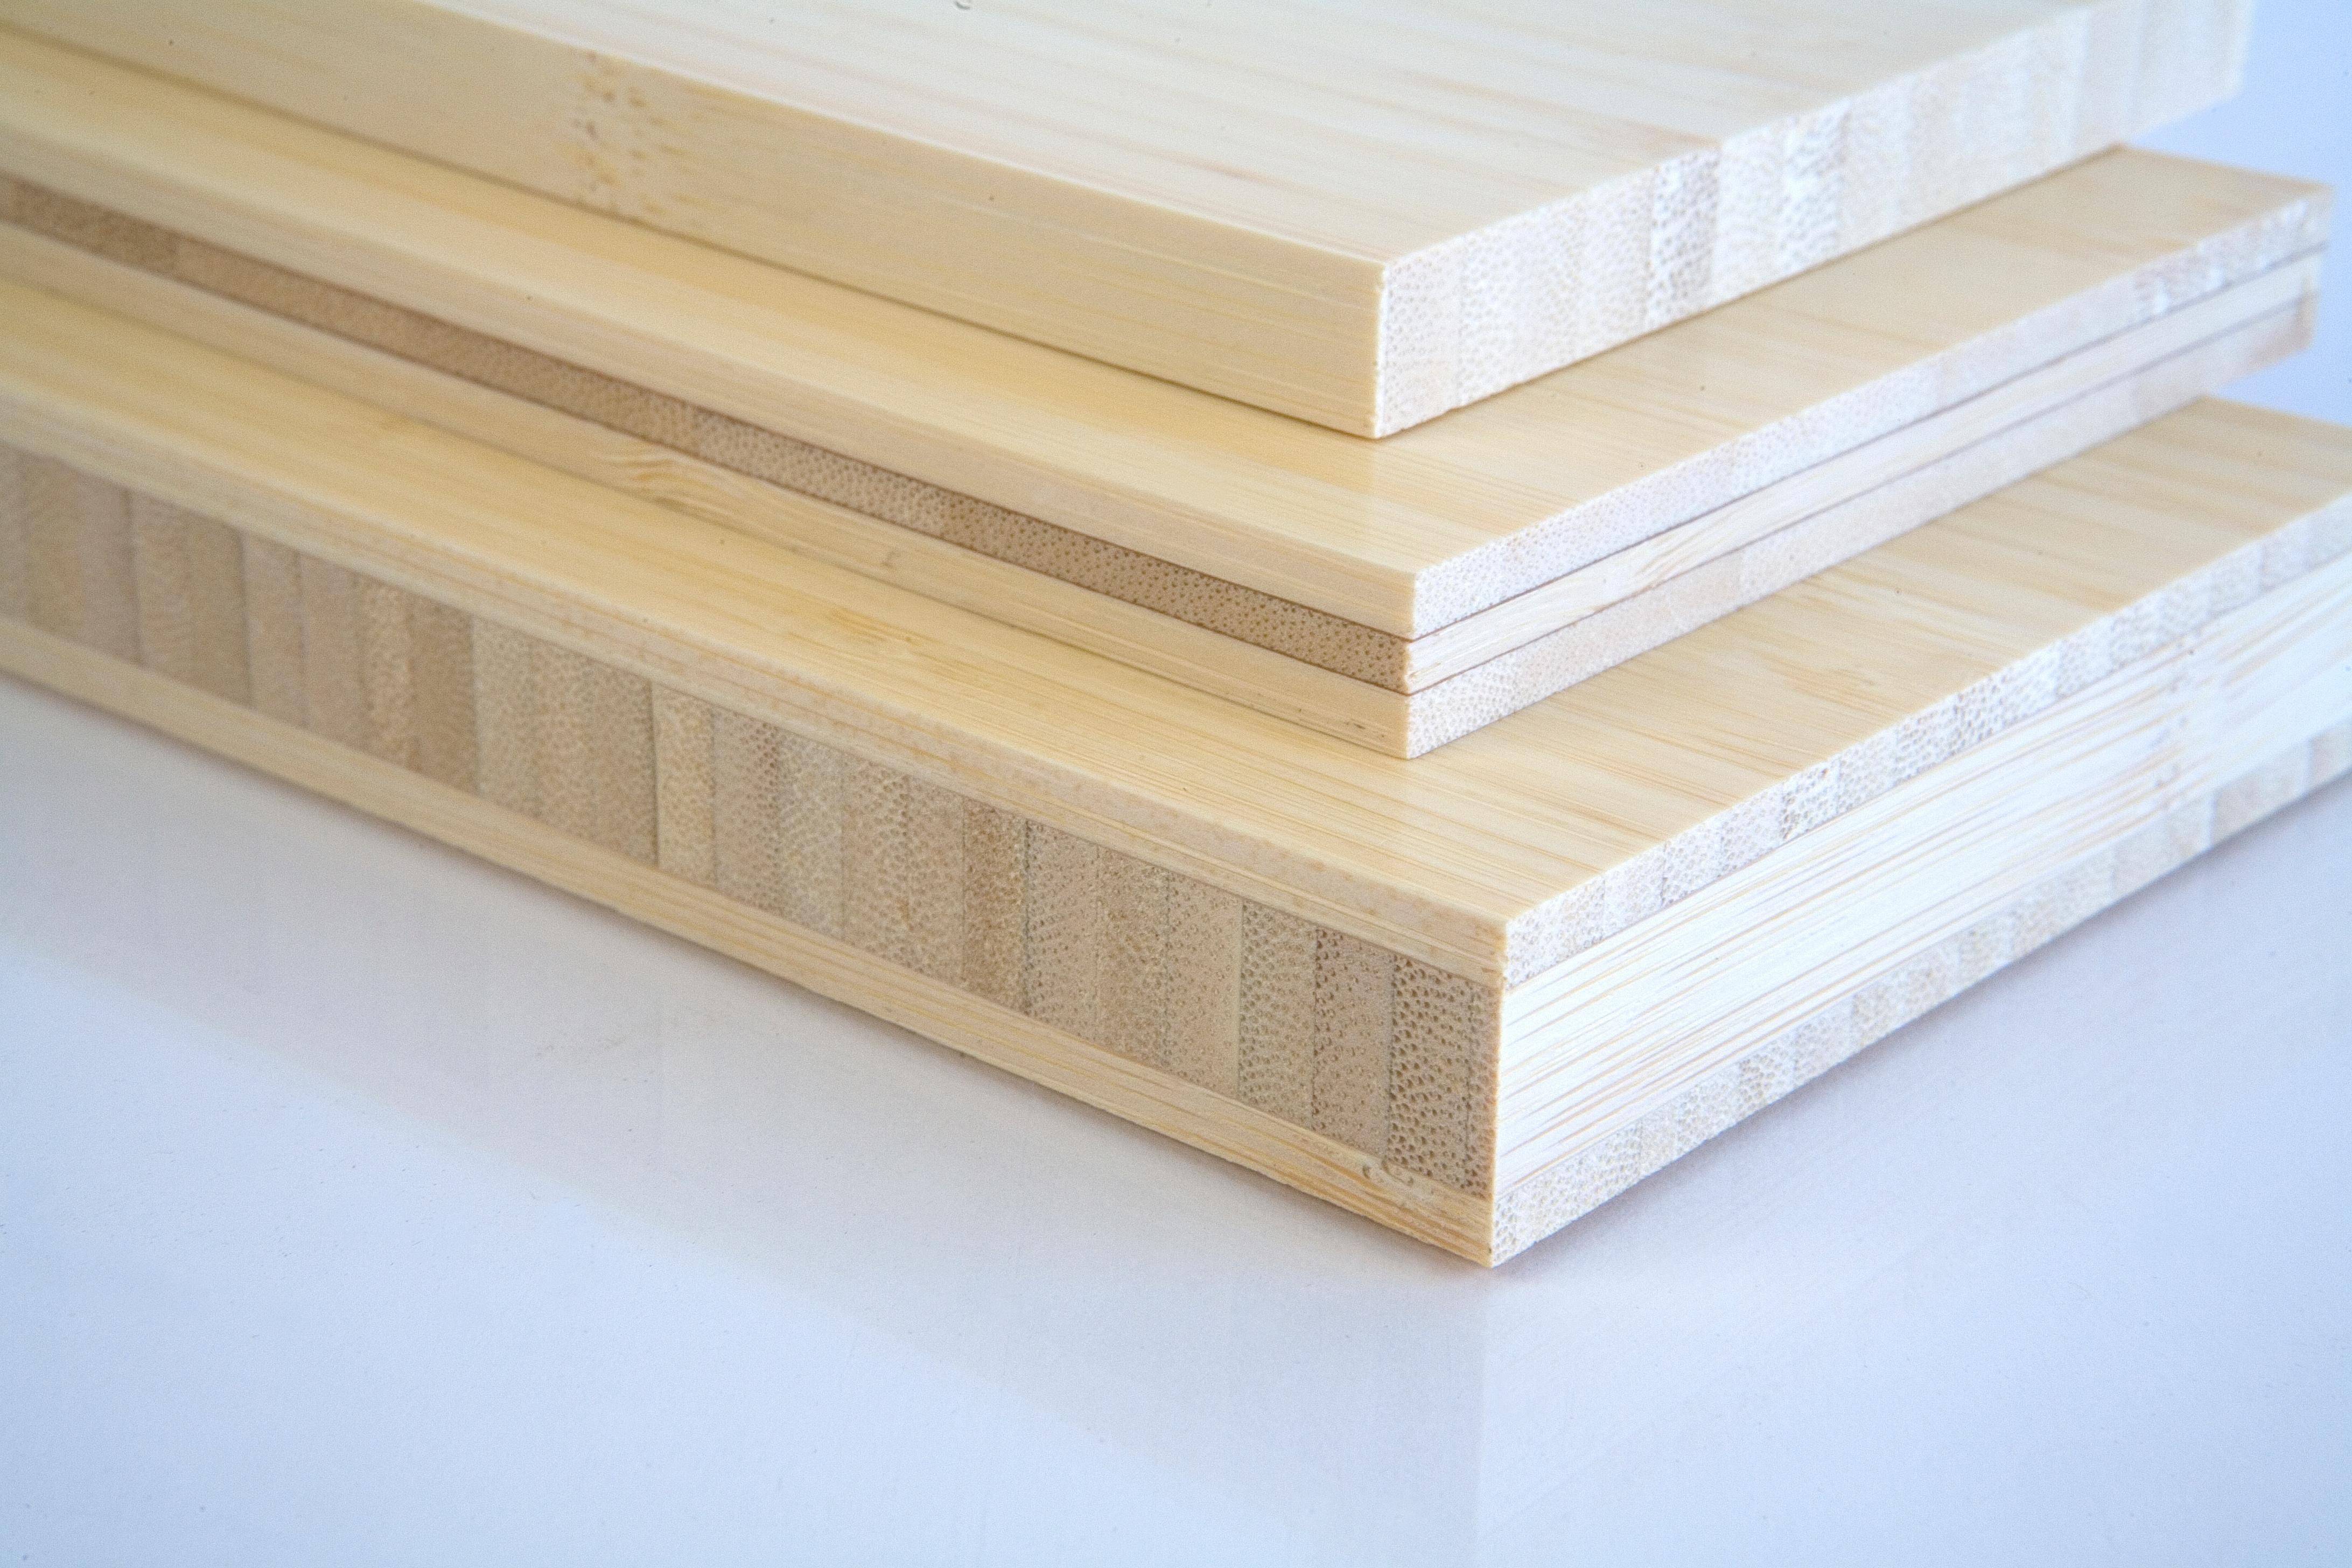 Bamboo stack